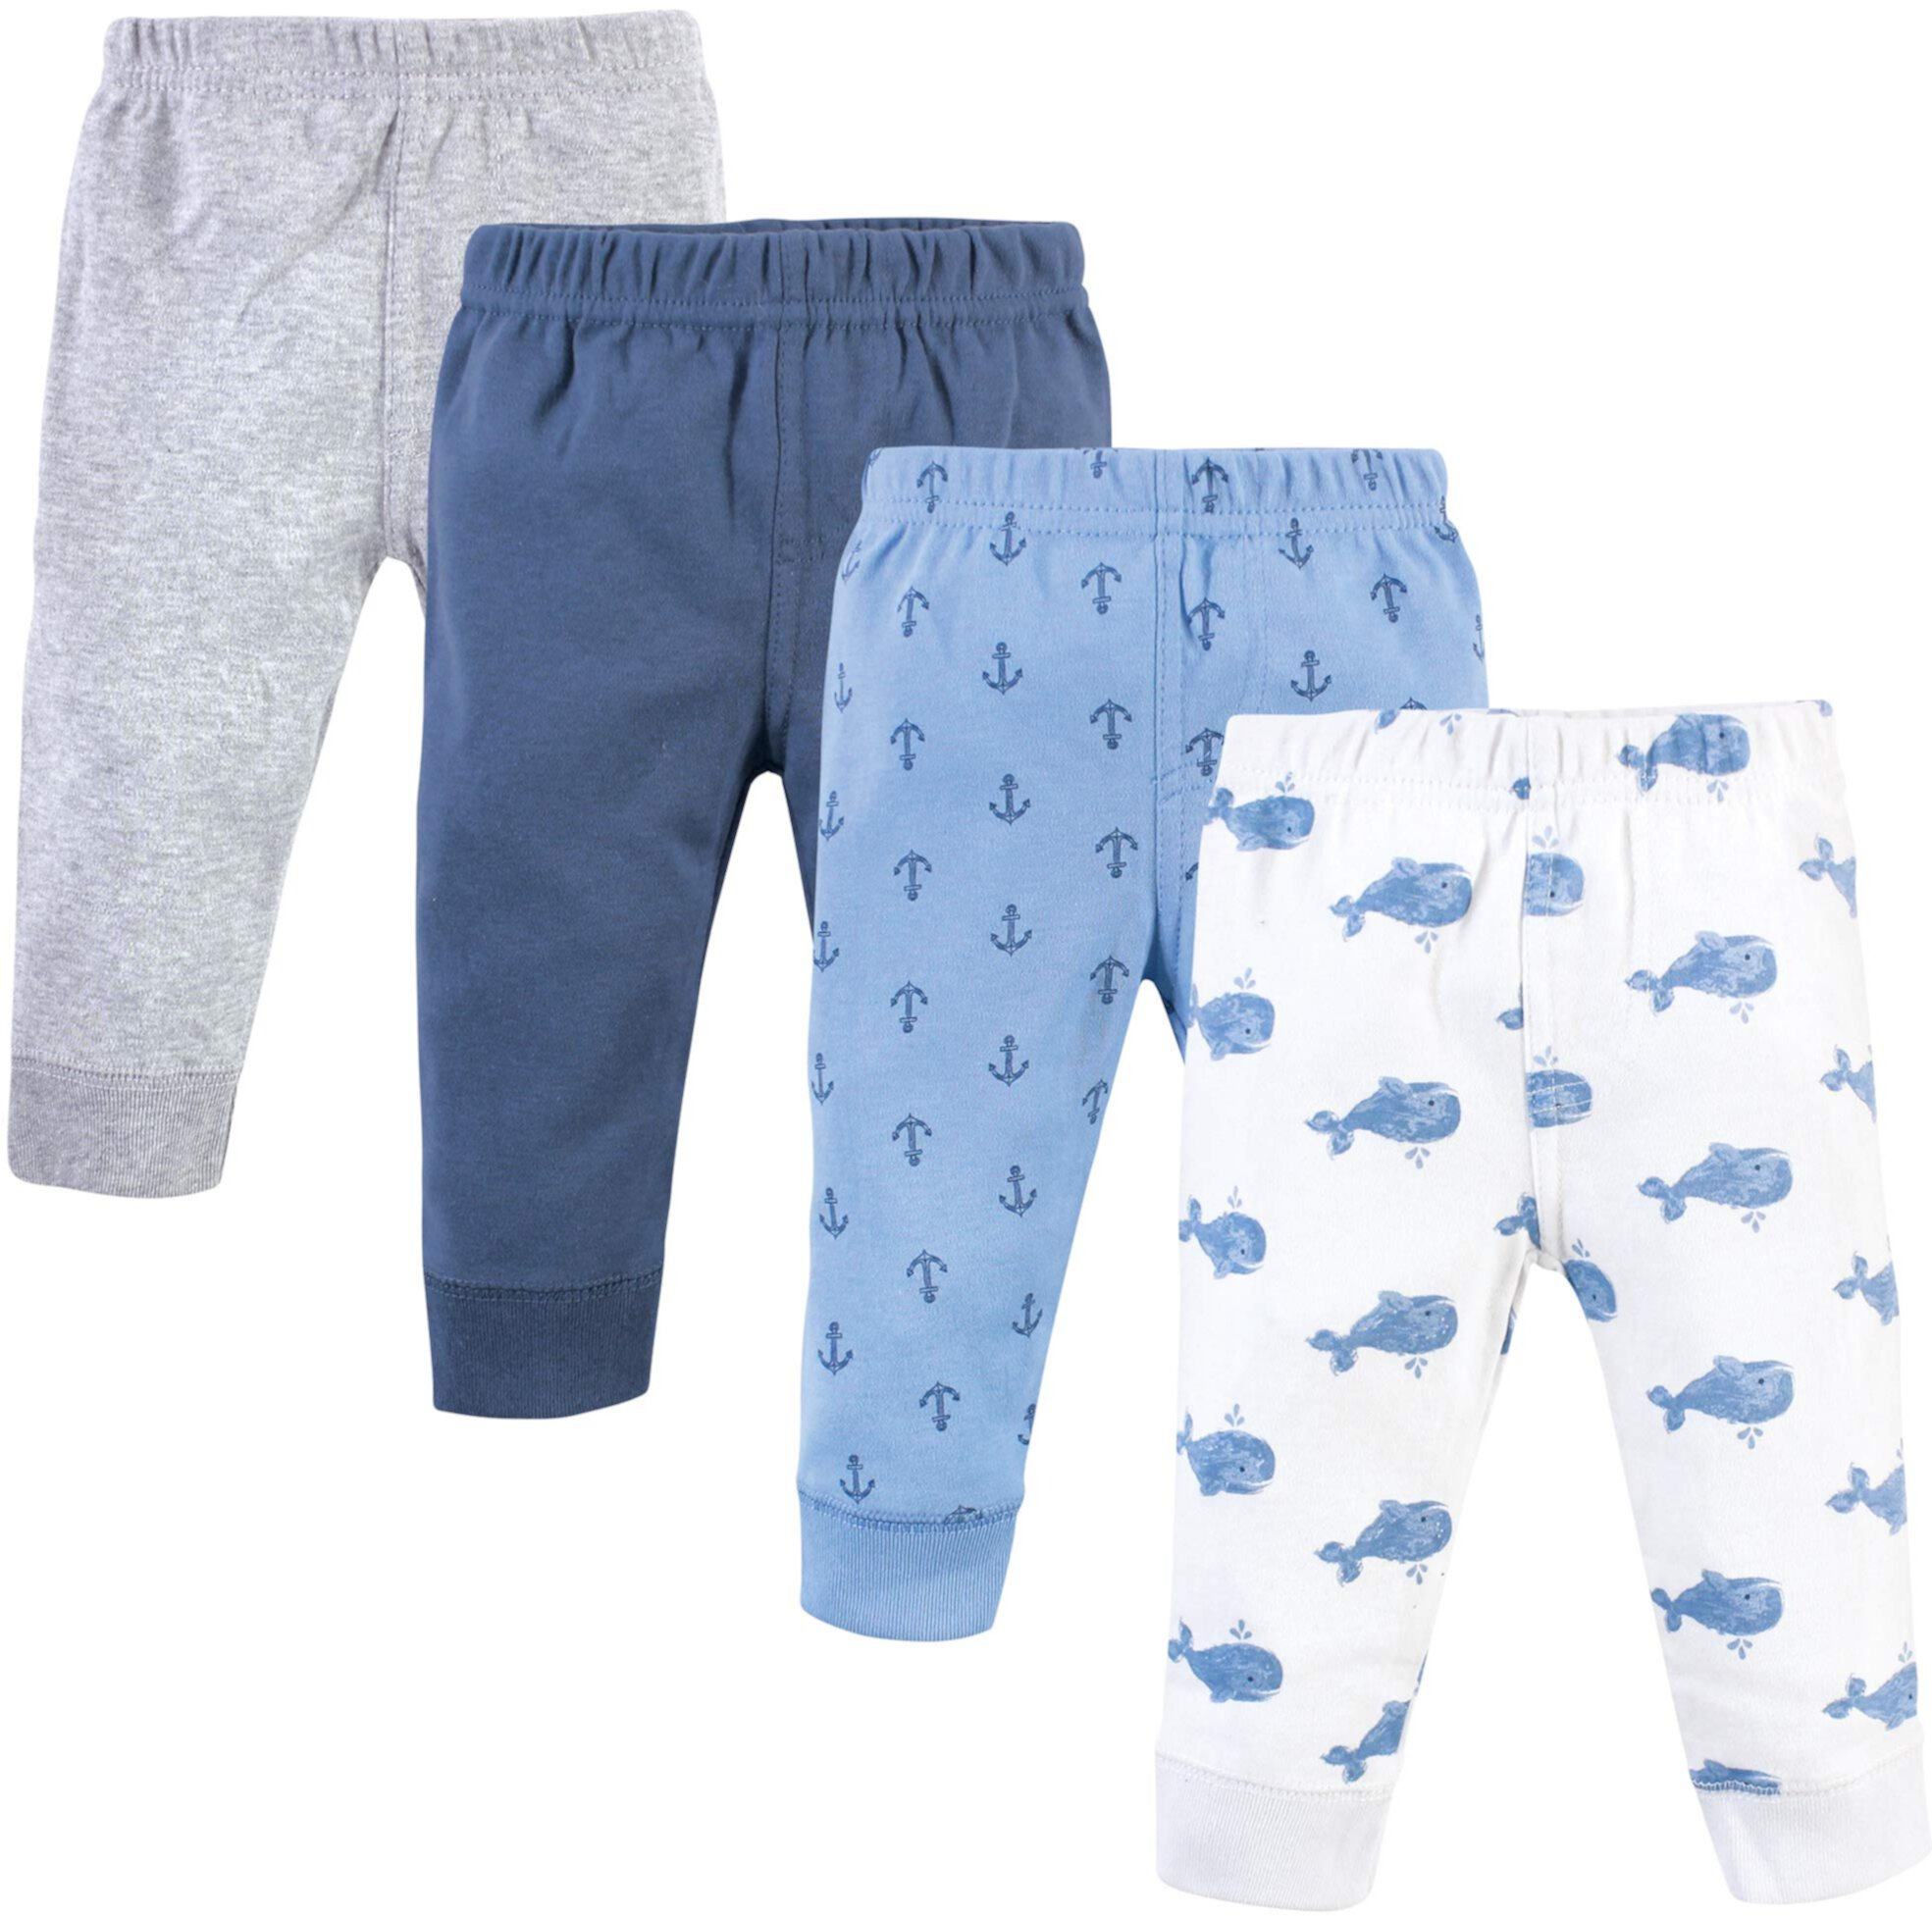 Cotton Pants and Leggings (Toddler) Hudson Baby